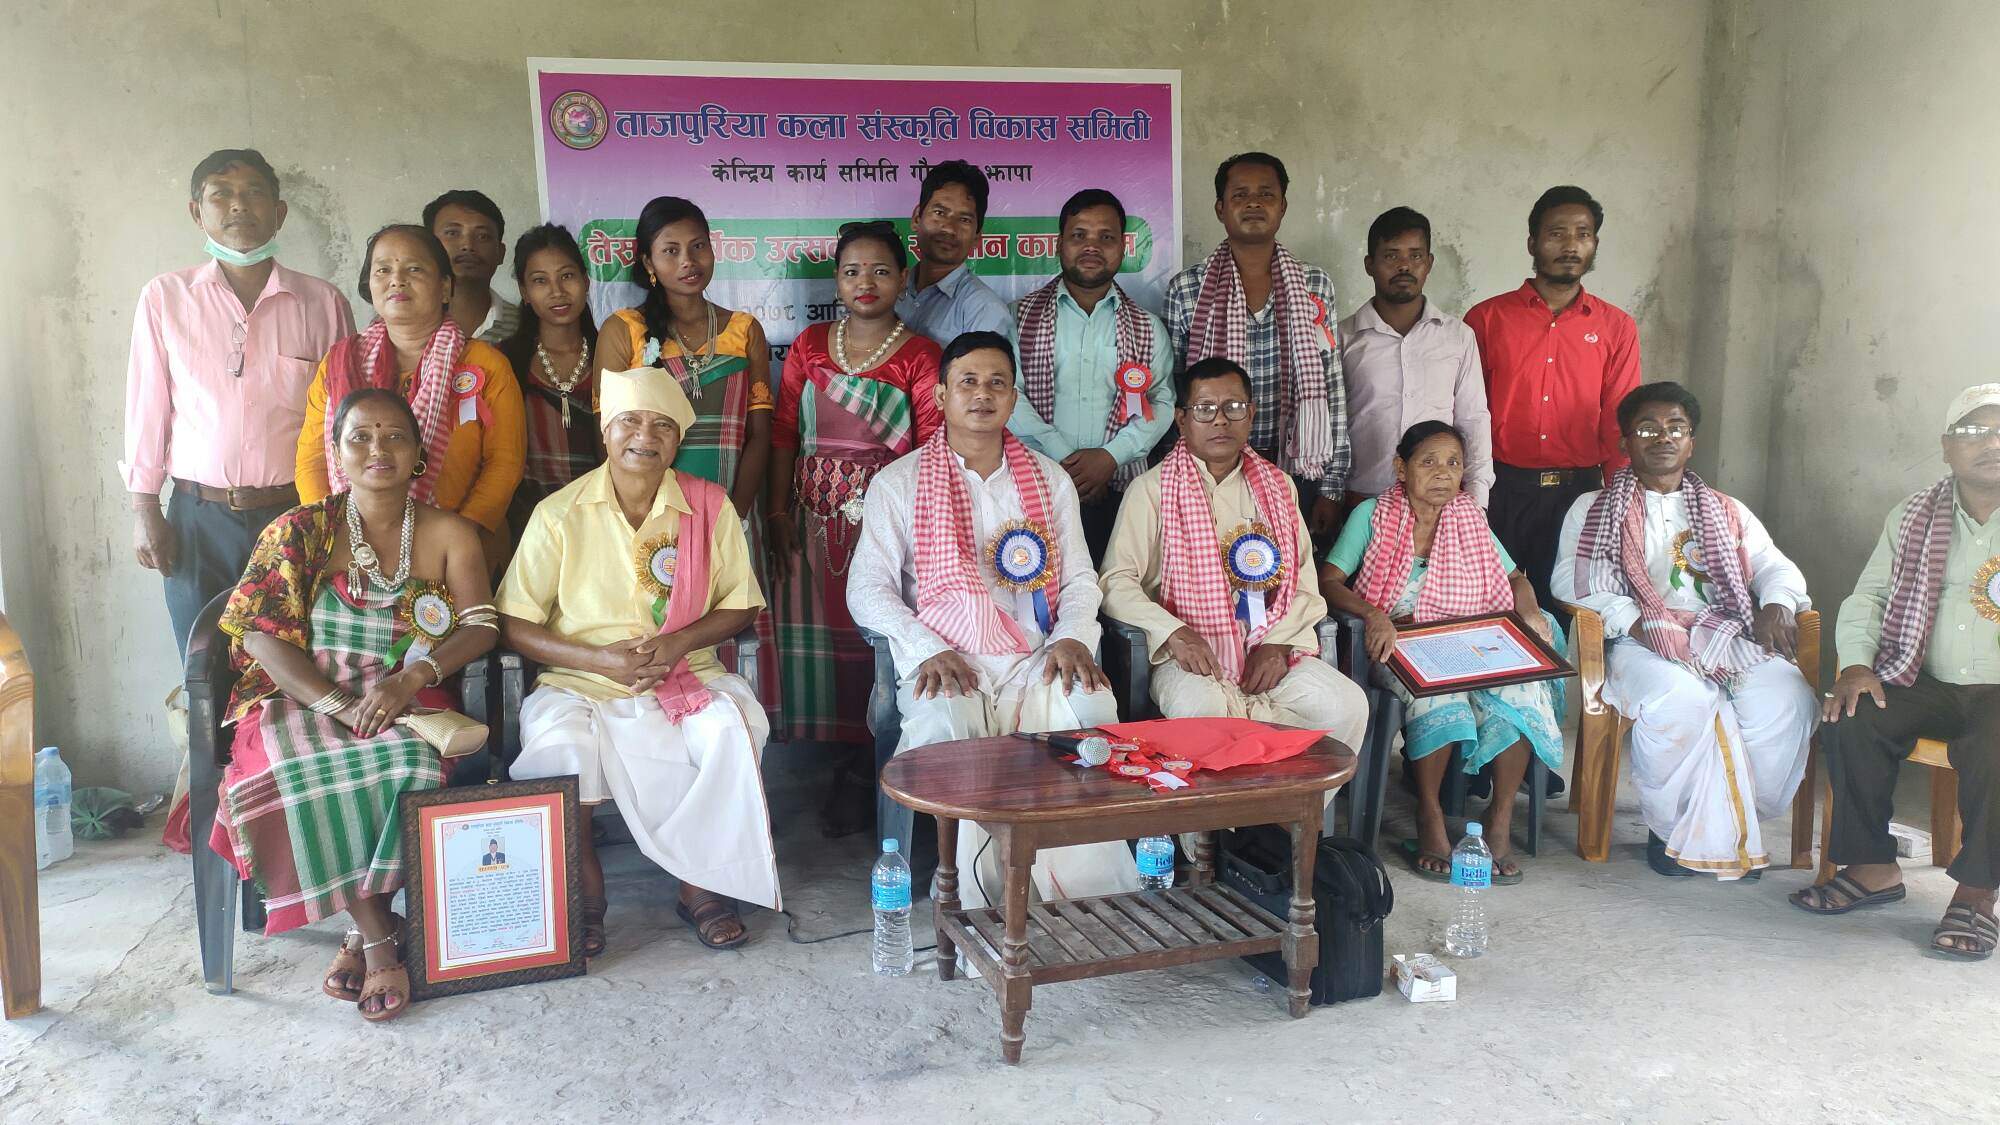 Tajpuriya News